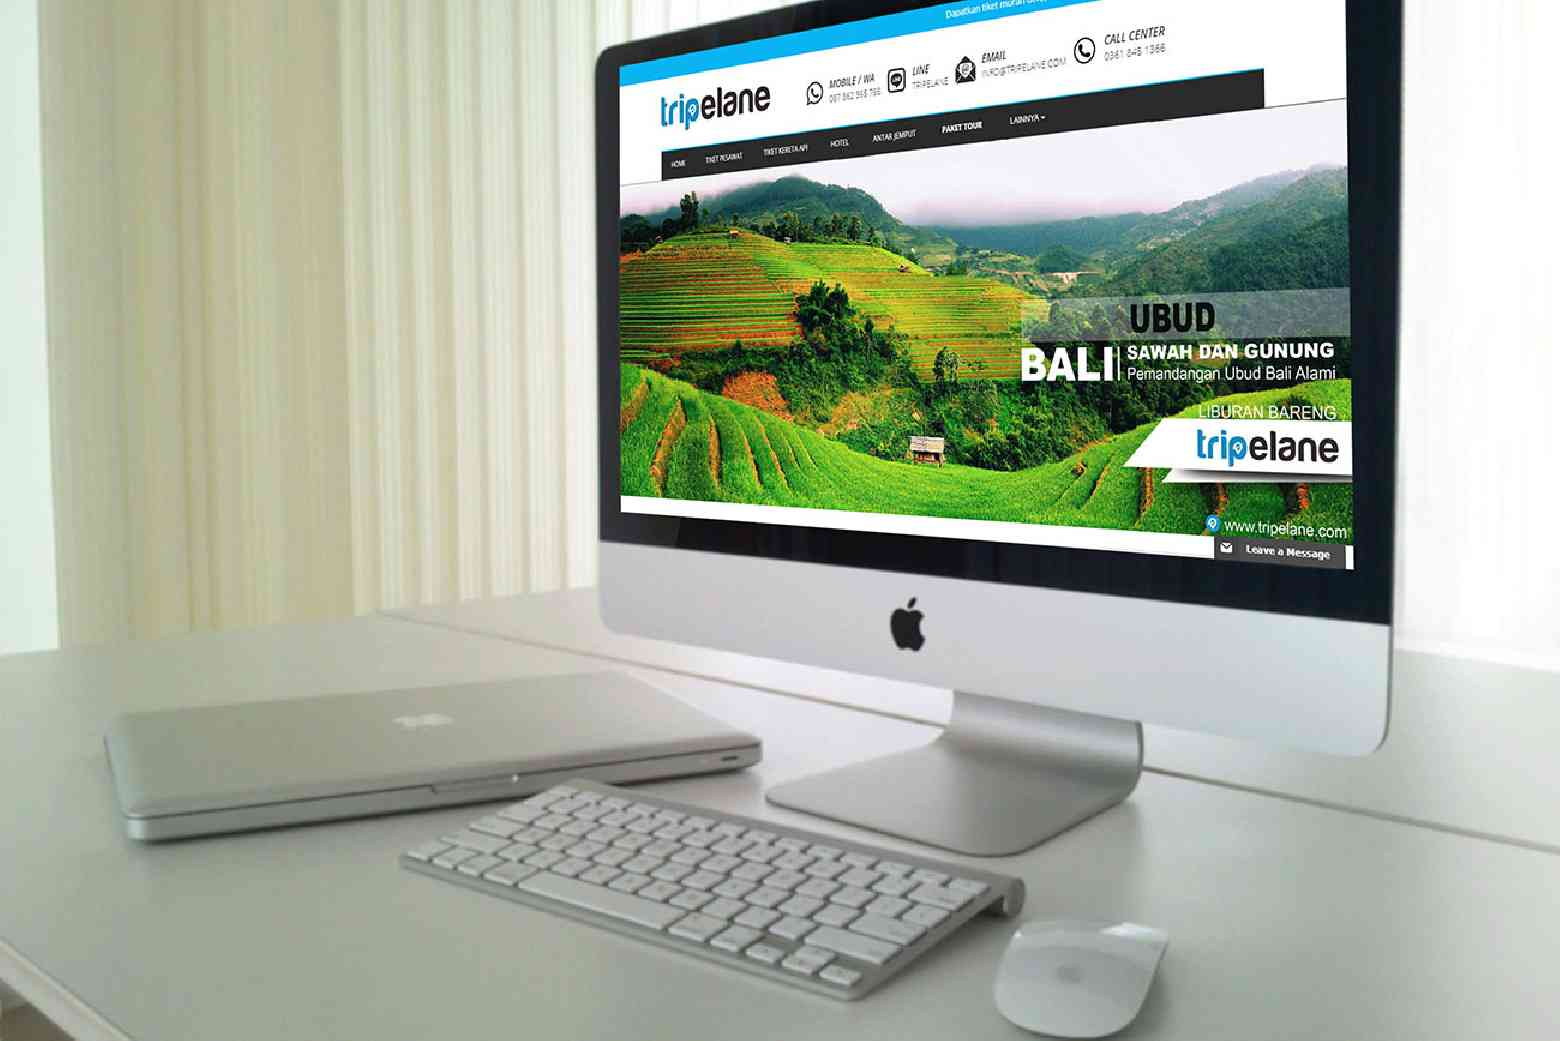 Tripelane Reservasi Online Tour and Travel